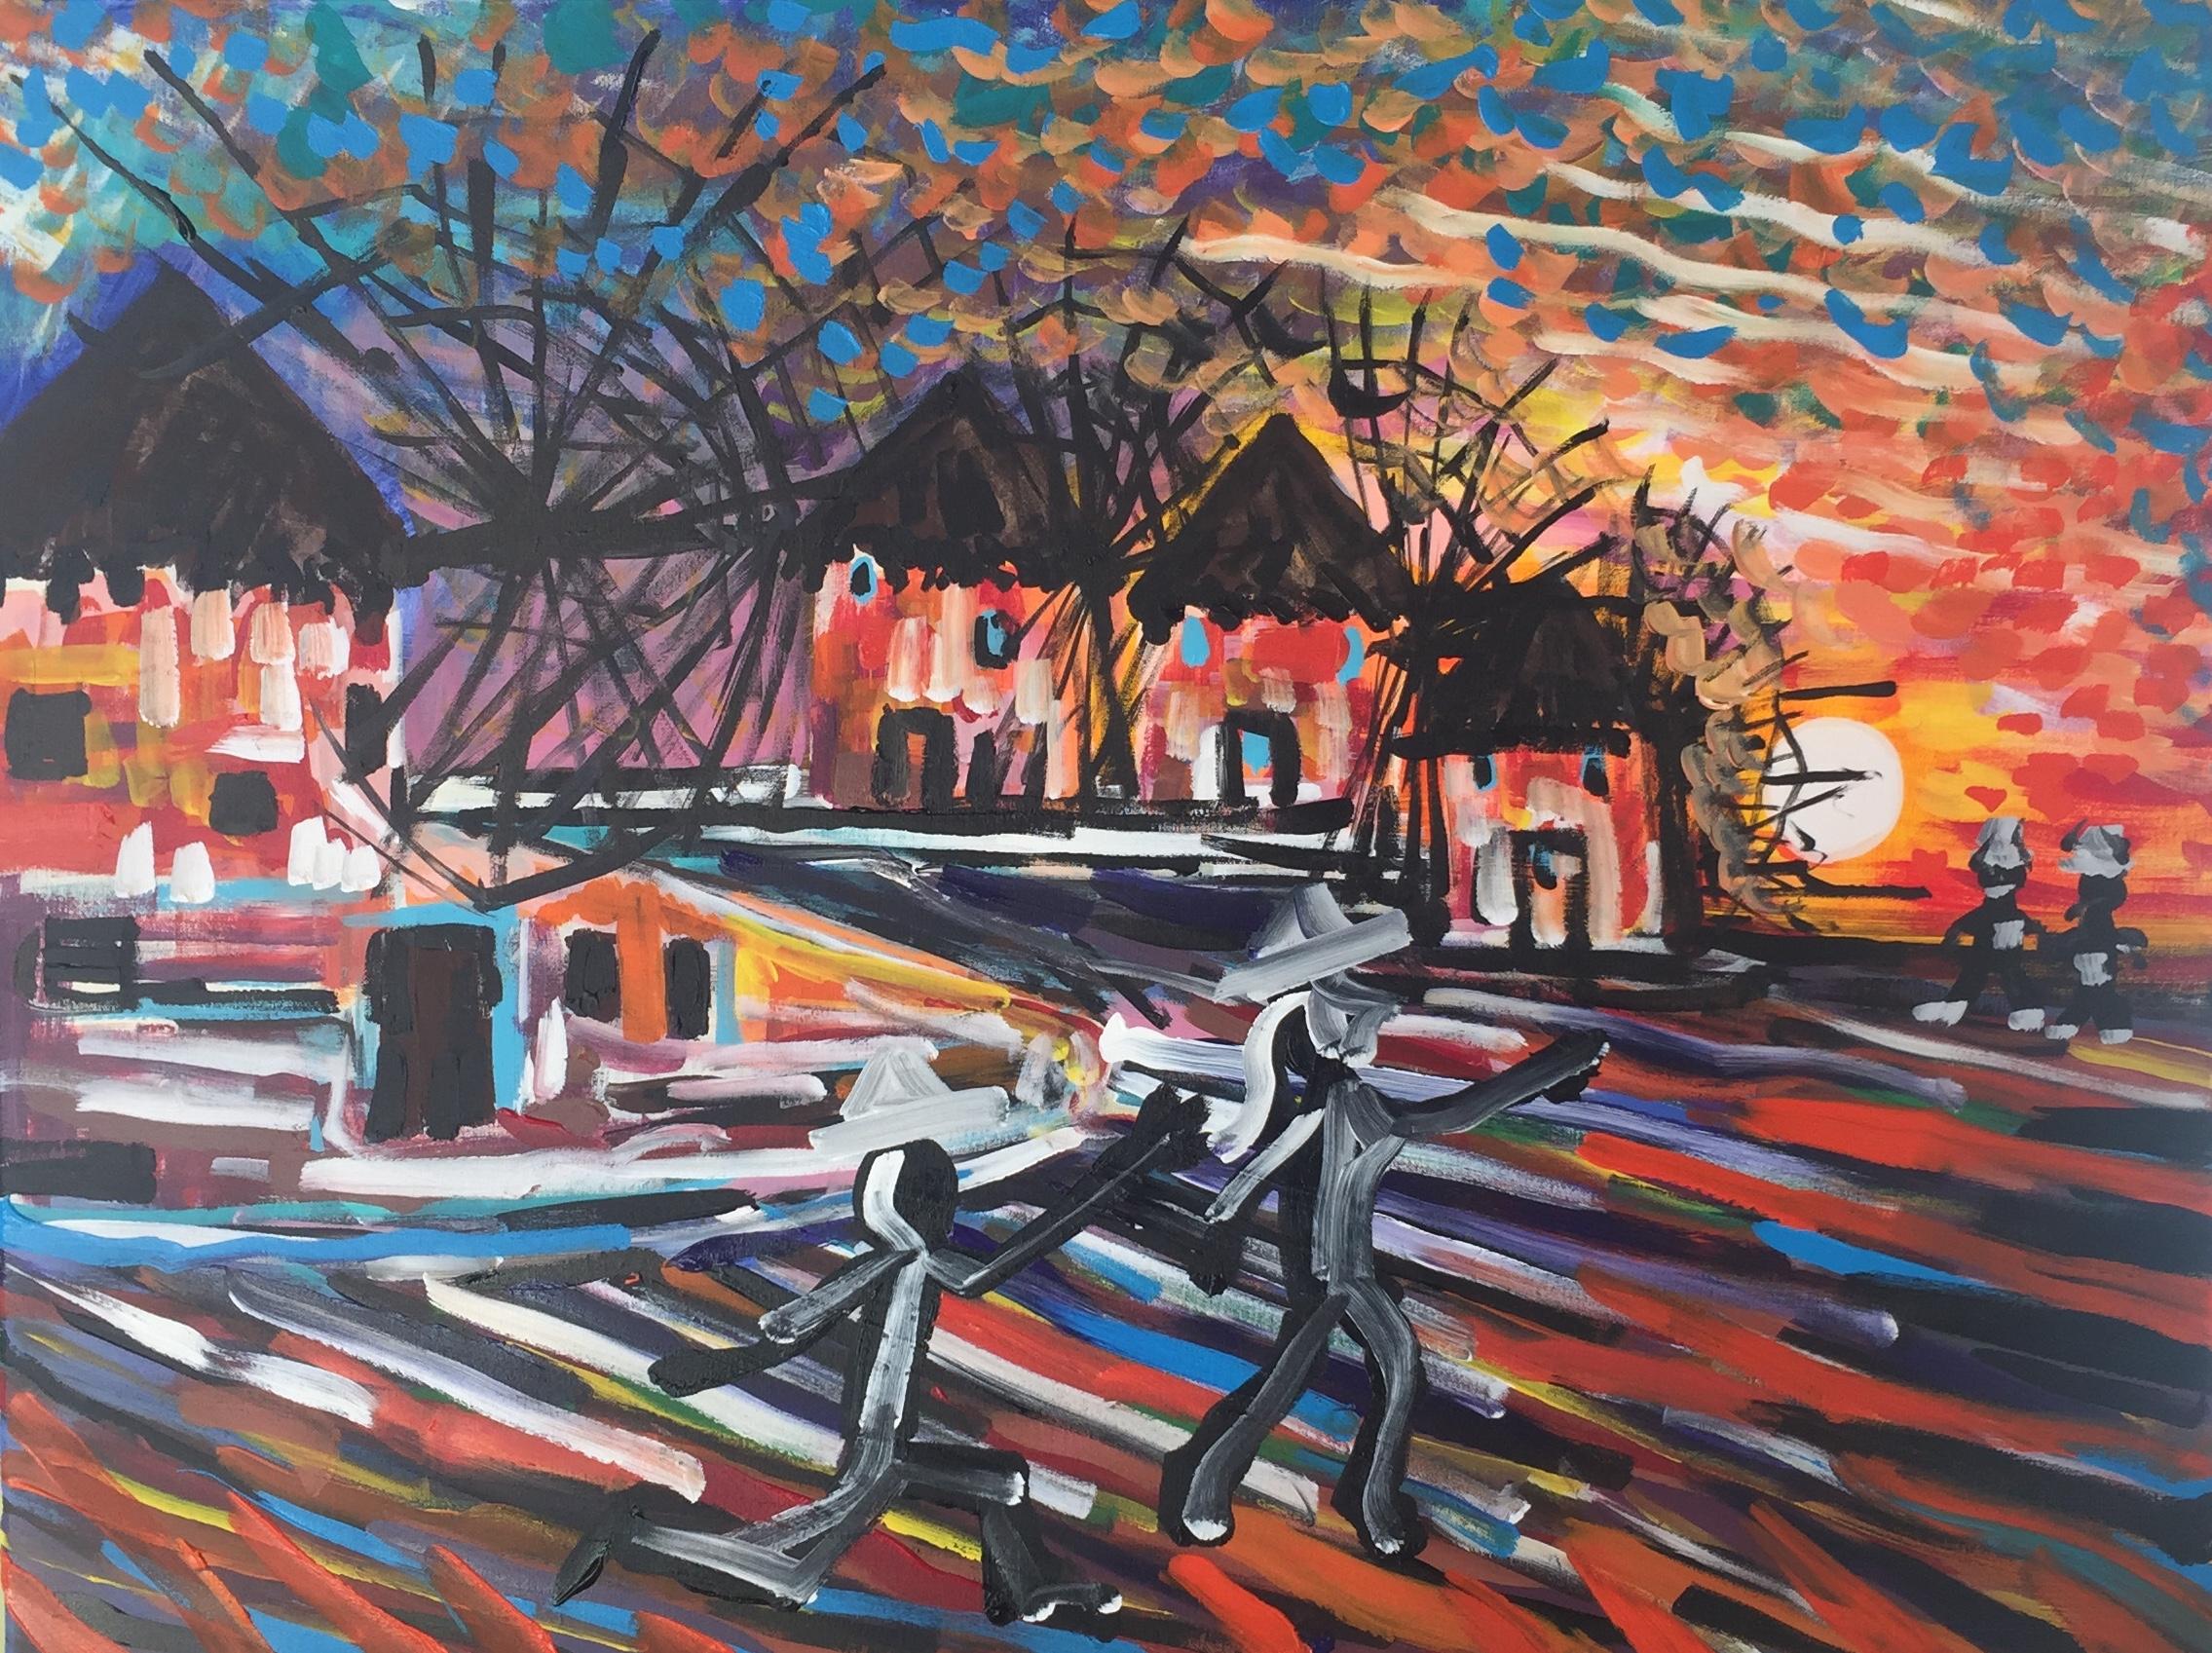 windmills in the sky, acrylic on canvas, cm 60 x cm 80, Occhiobello, 2020